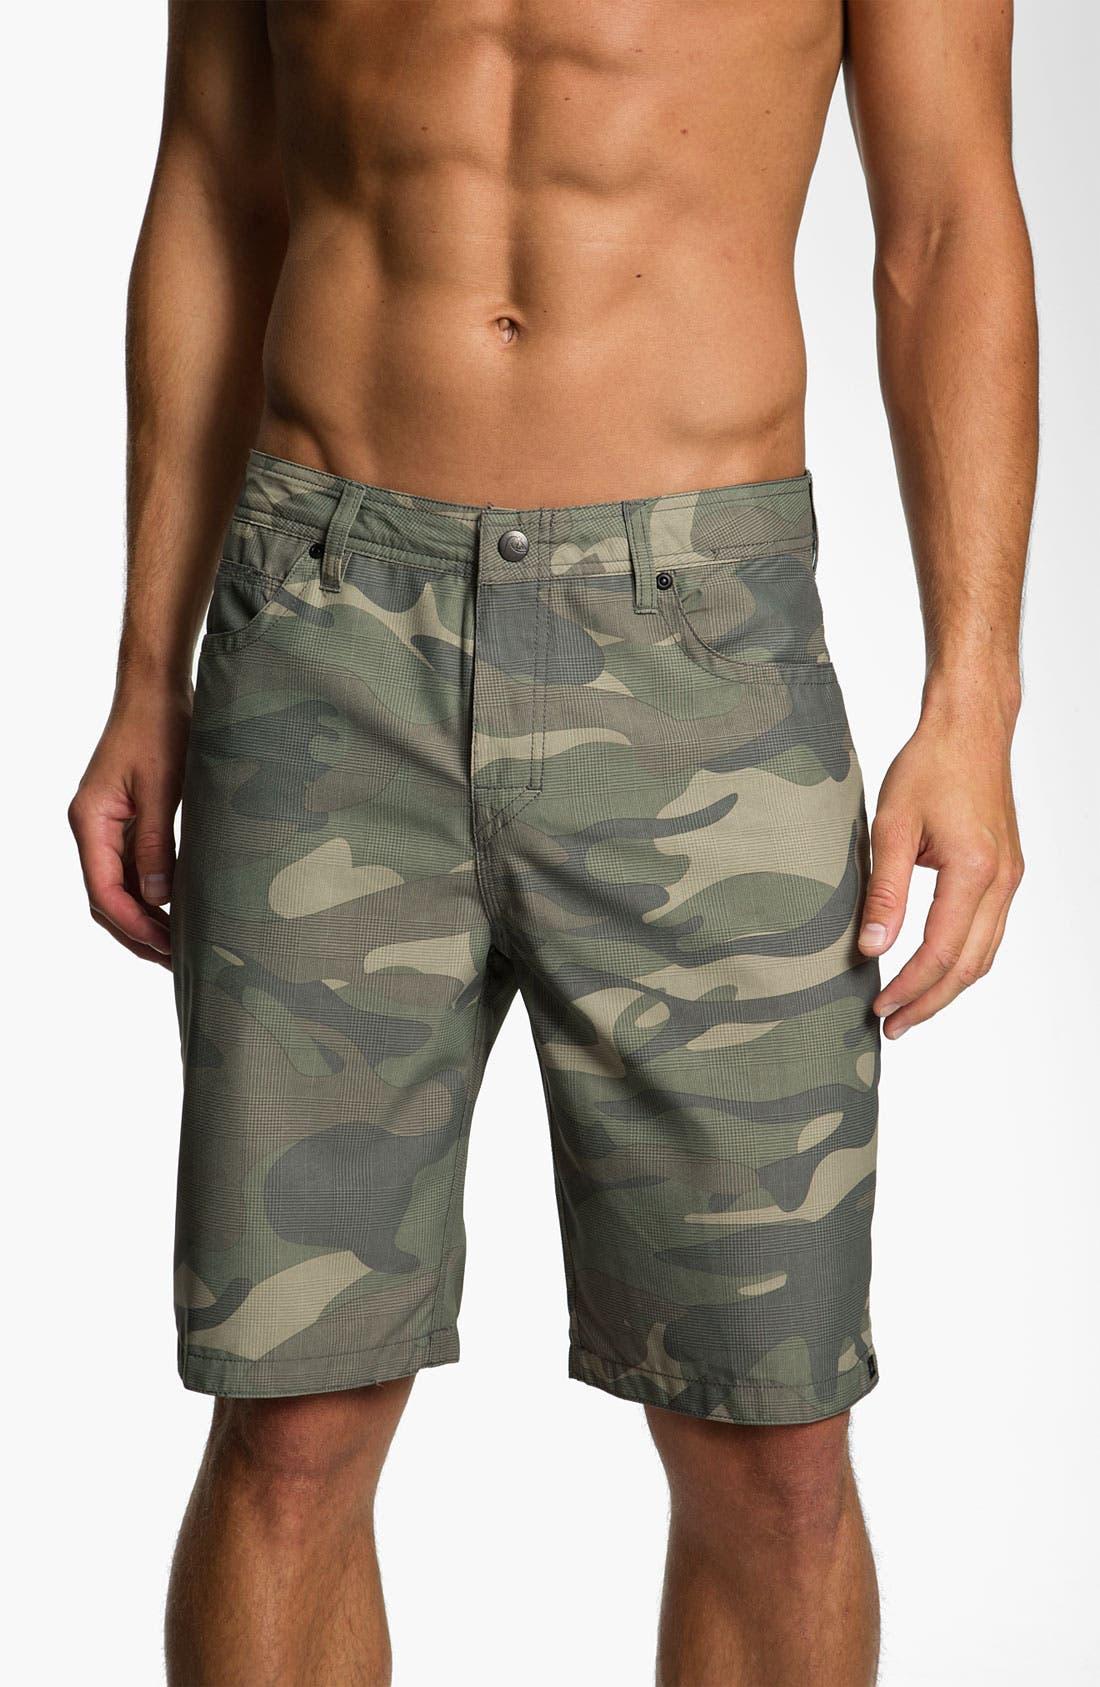 Alternate Image 1 Selected - Quiksilver 'Kickdrum' Shorts